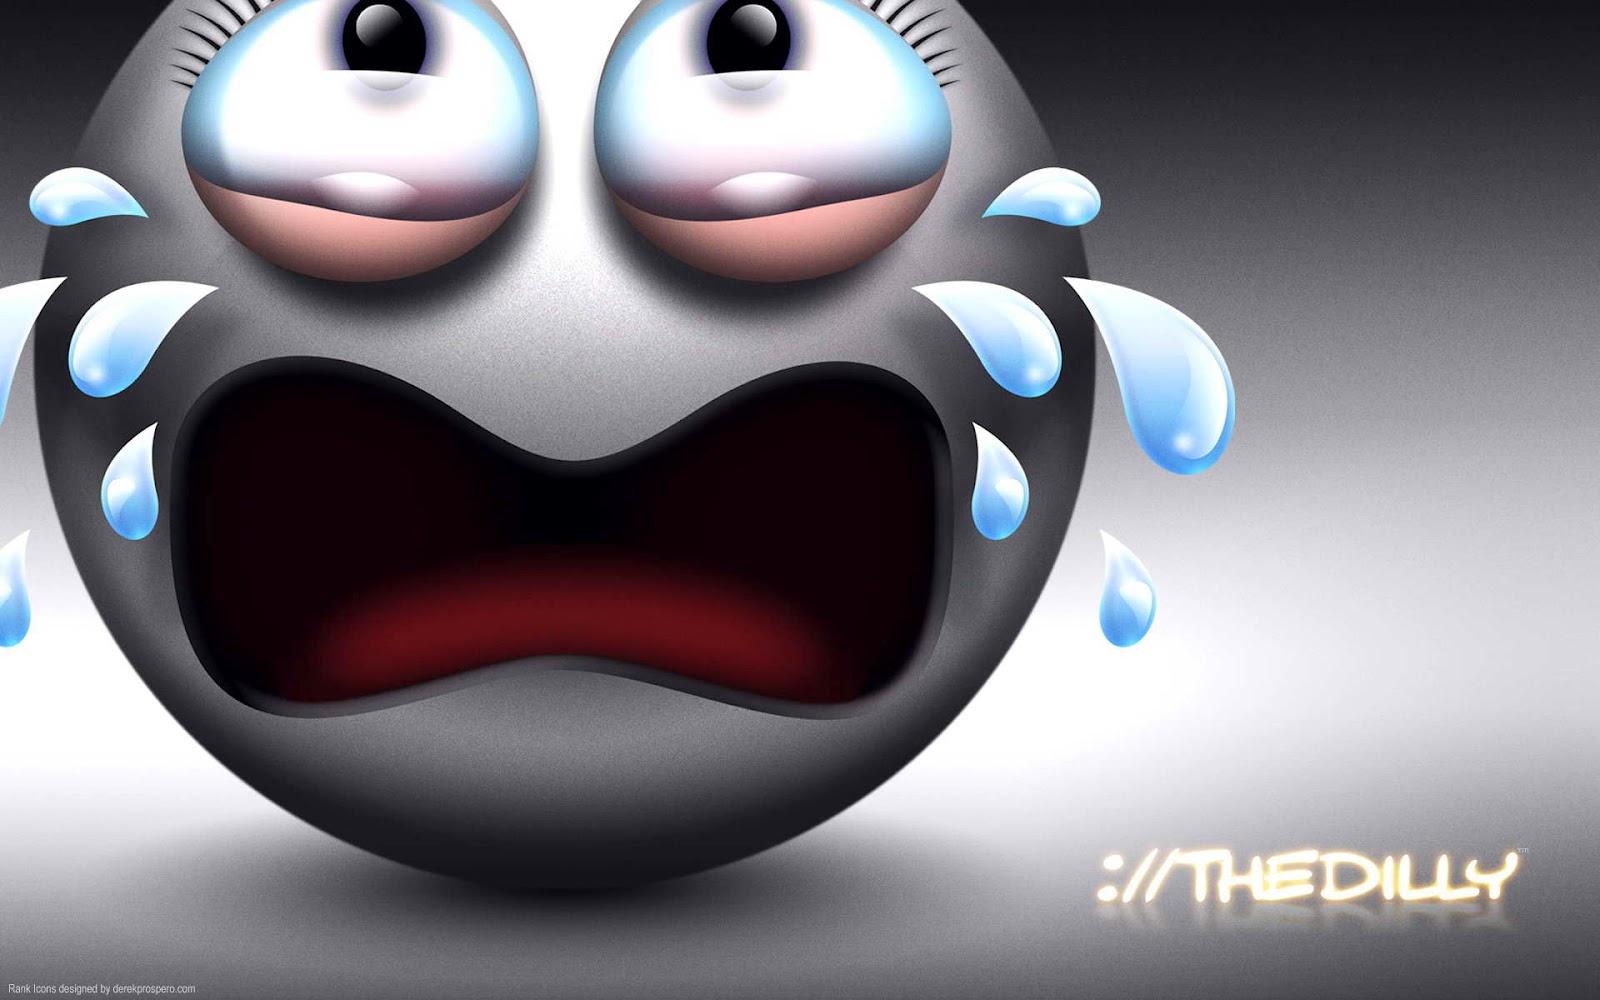 Desktop wallpaper smiley 3d wallpaper - 3d animation pictures desktop ...